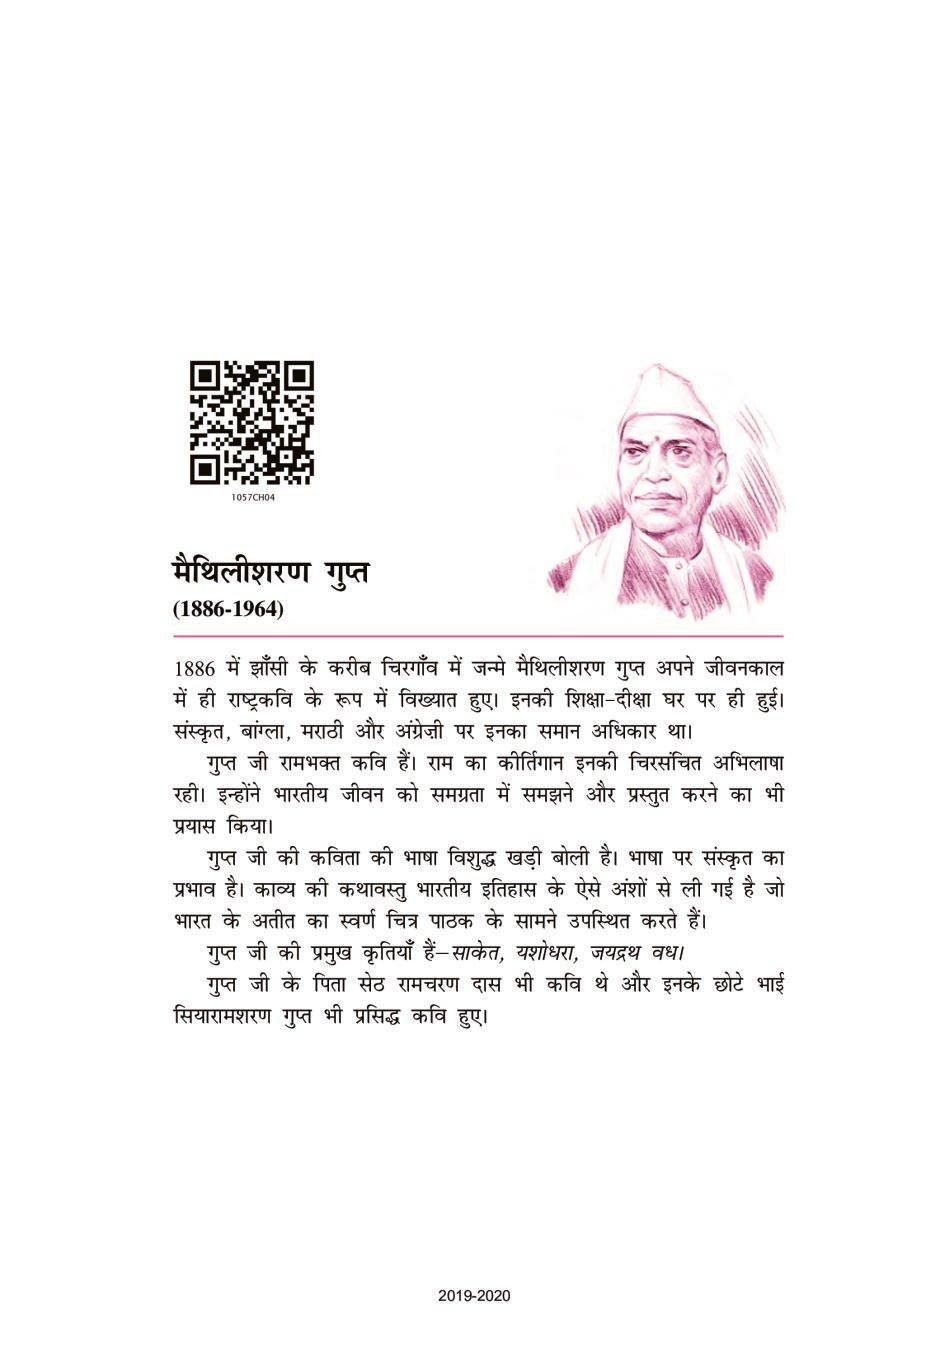 NCERT Book Class 10 Hindi (स्पर्श) Chapter 4 मनुष्यता - Page 1